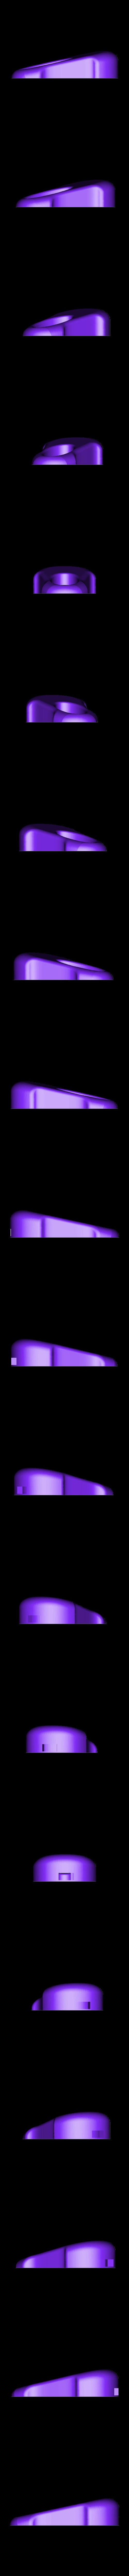 Stamets_dual_1.stl Download free STL file Stammets spore drive implants • 3D print design, poblocki1982